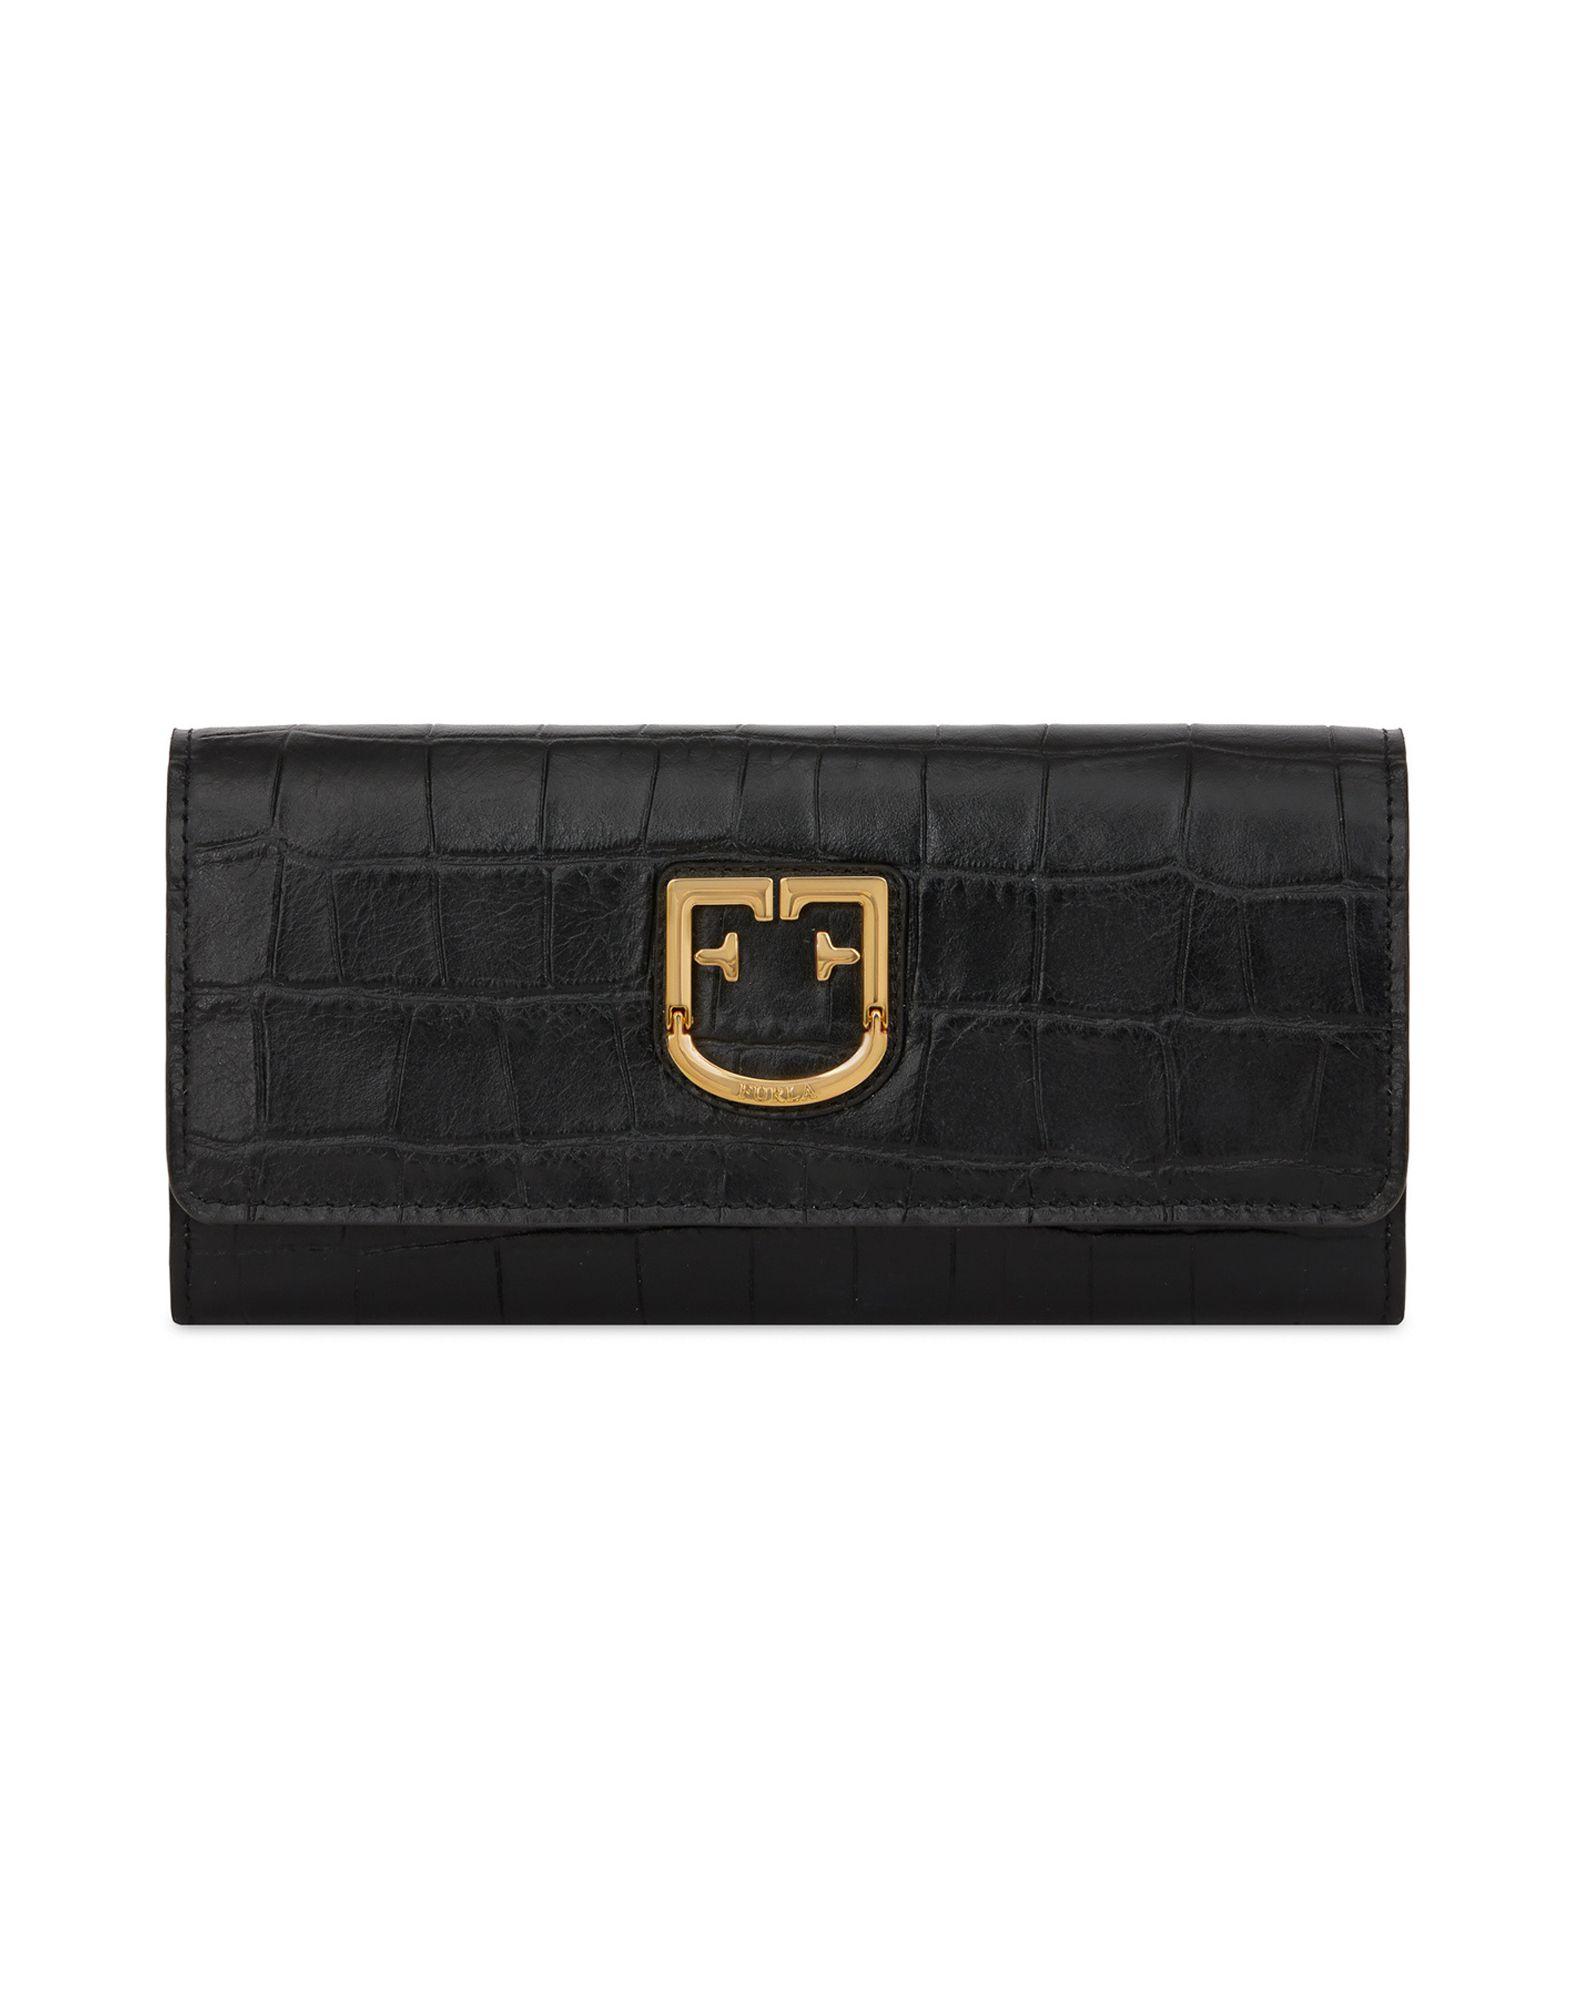 8709e7b4a797 《送料無料》FURLA レディース 財布 ブラック 革 100% FURLA BELVEDERE XL BI-